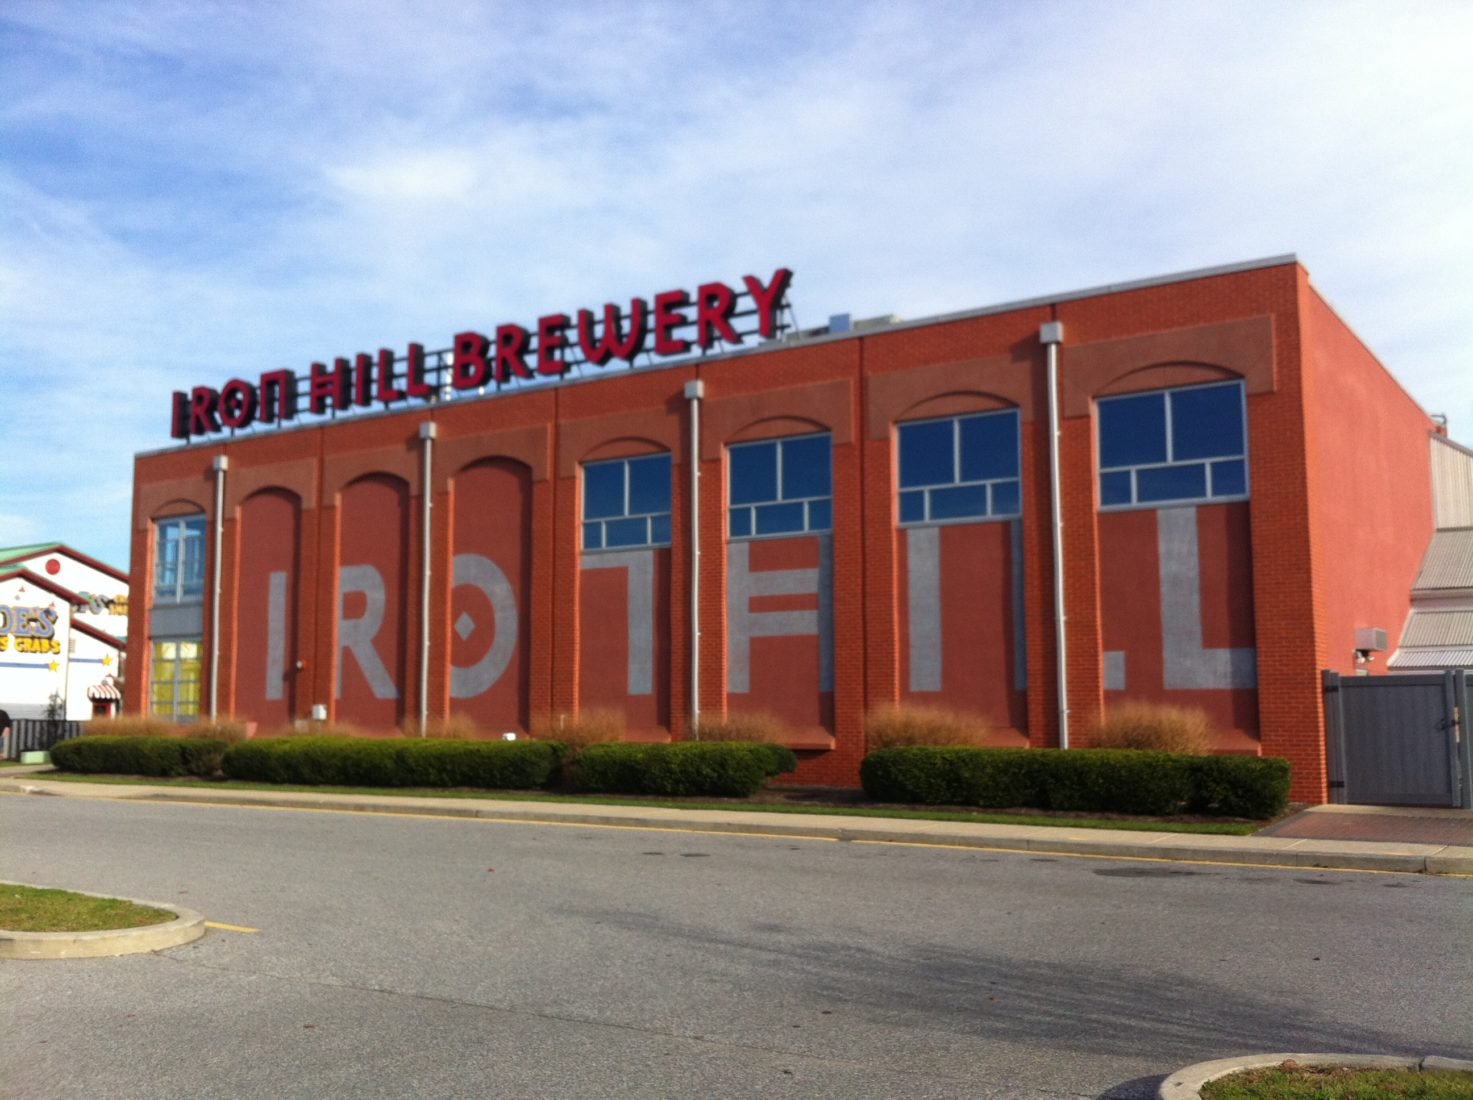 47. Iron Hill Brewery, Wilmington DE 2003